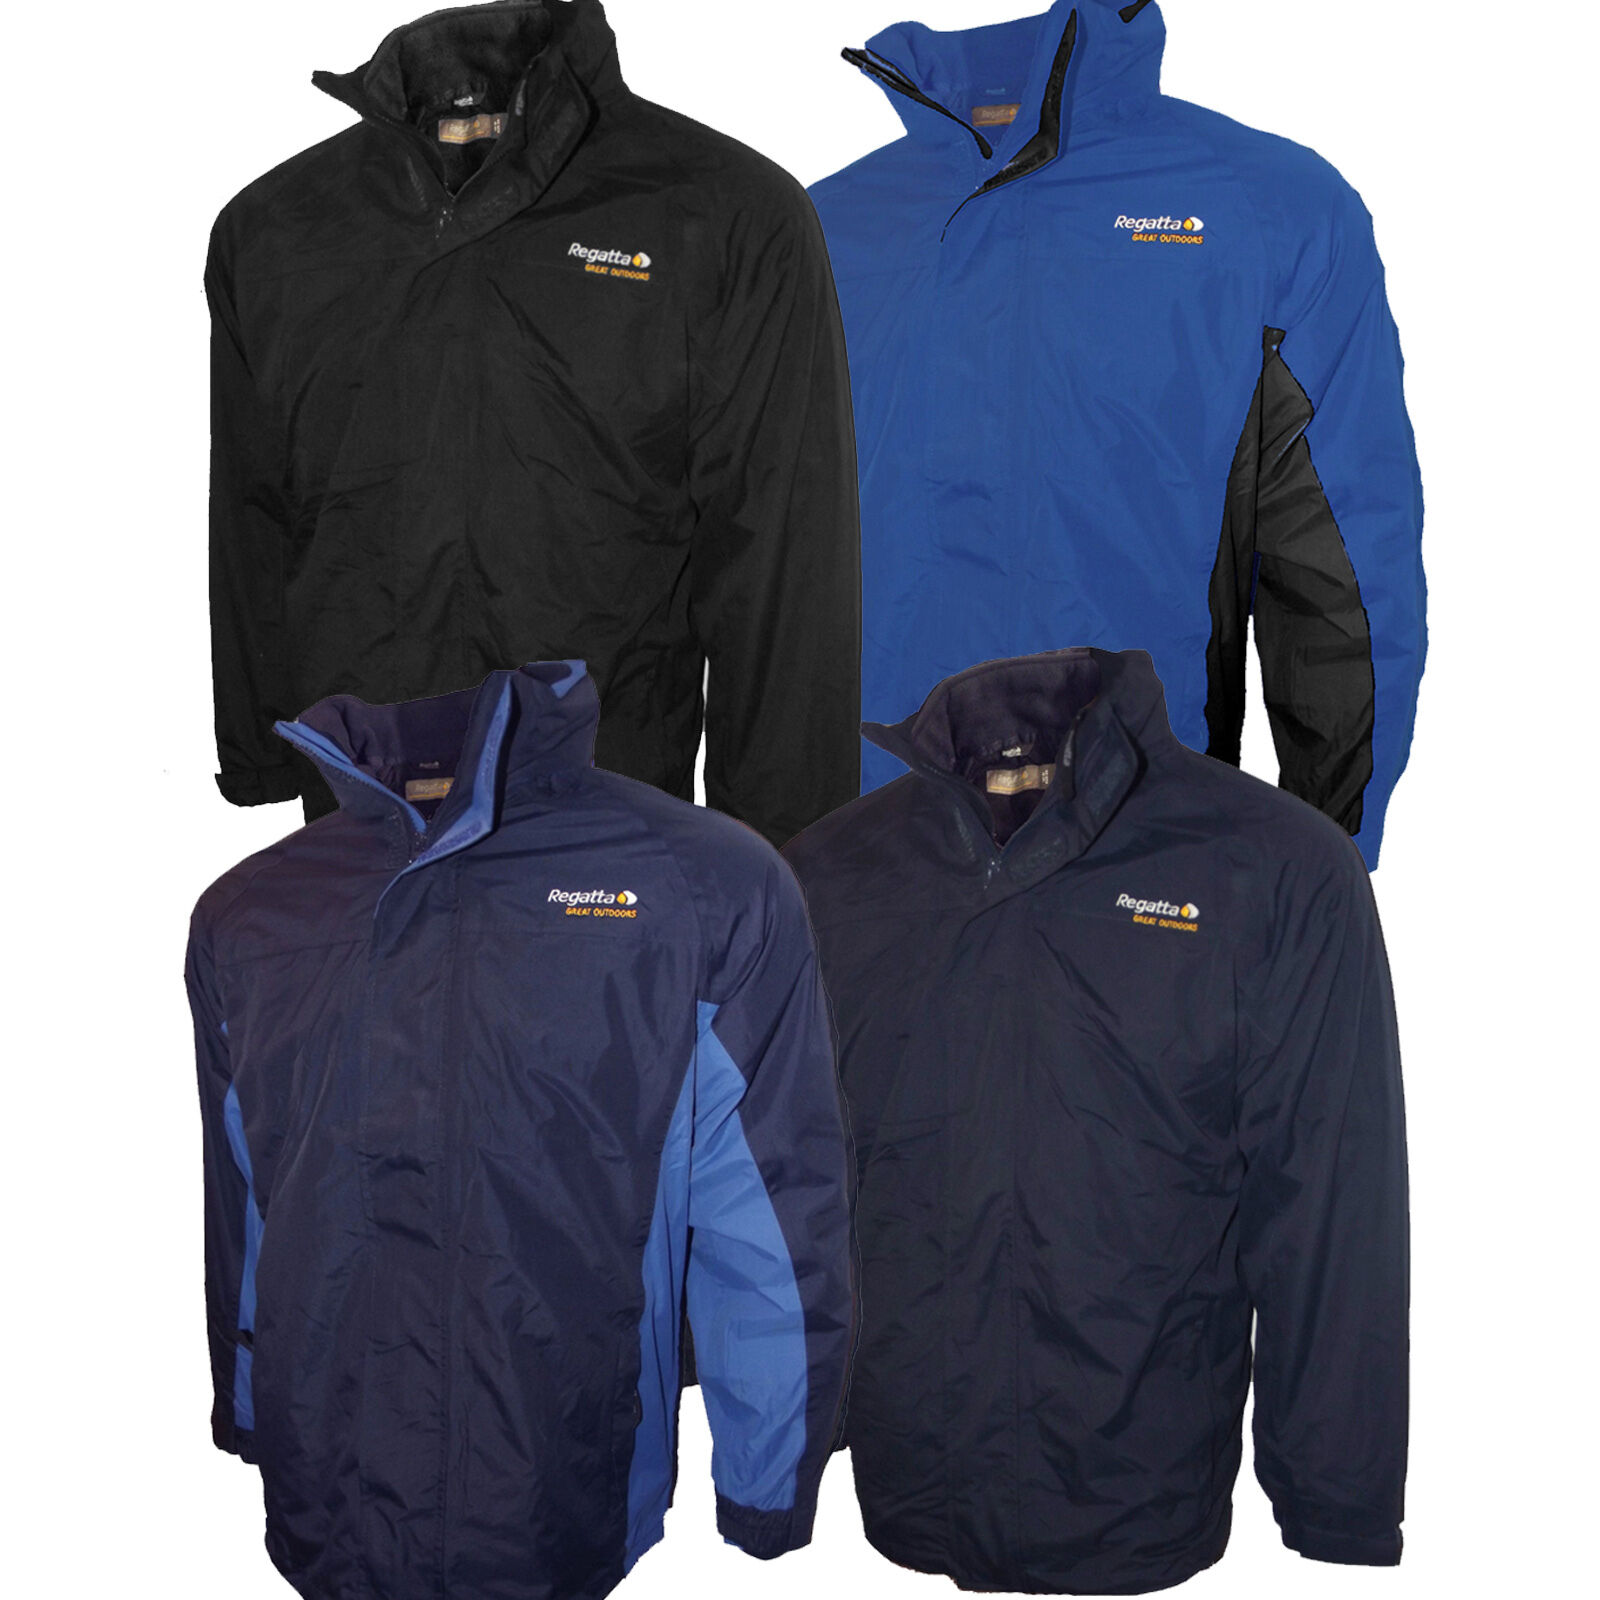 Mens 3 in 1 Jacket | eBay